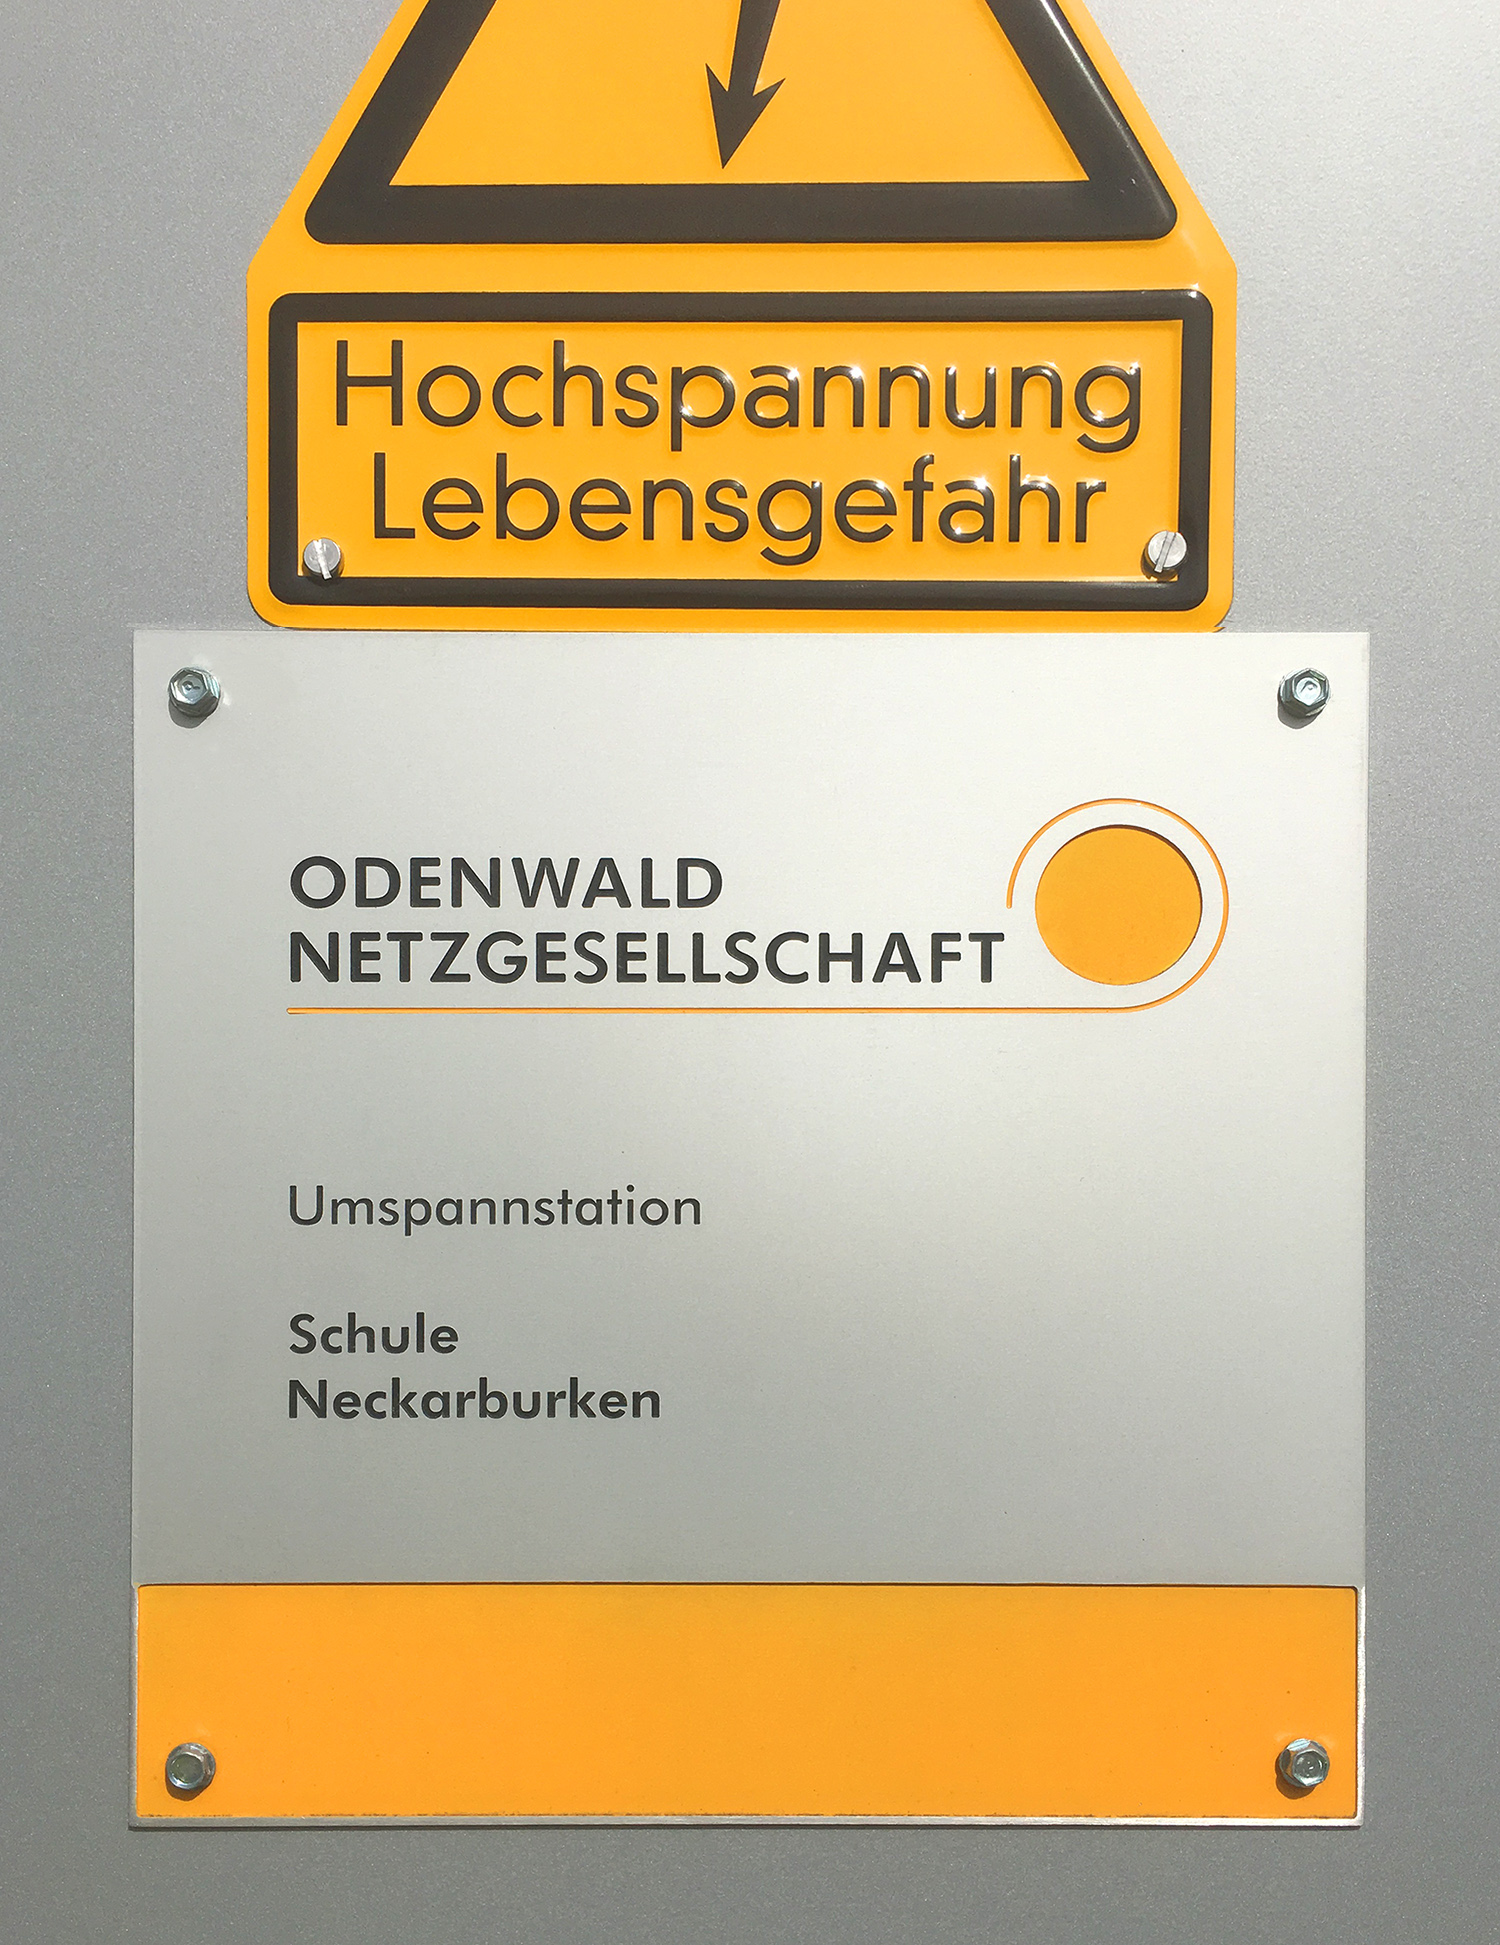 Odenwald Netzgesellschaft Corporate Design Trafostation